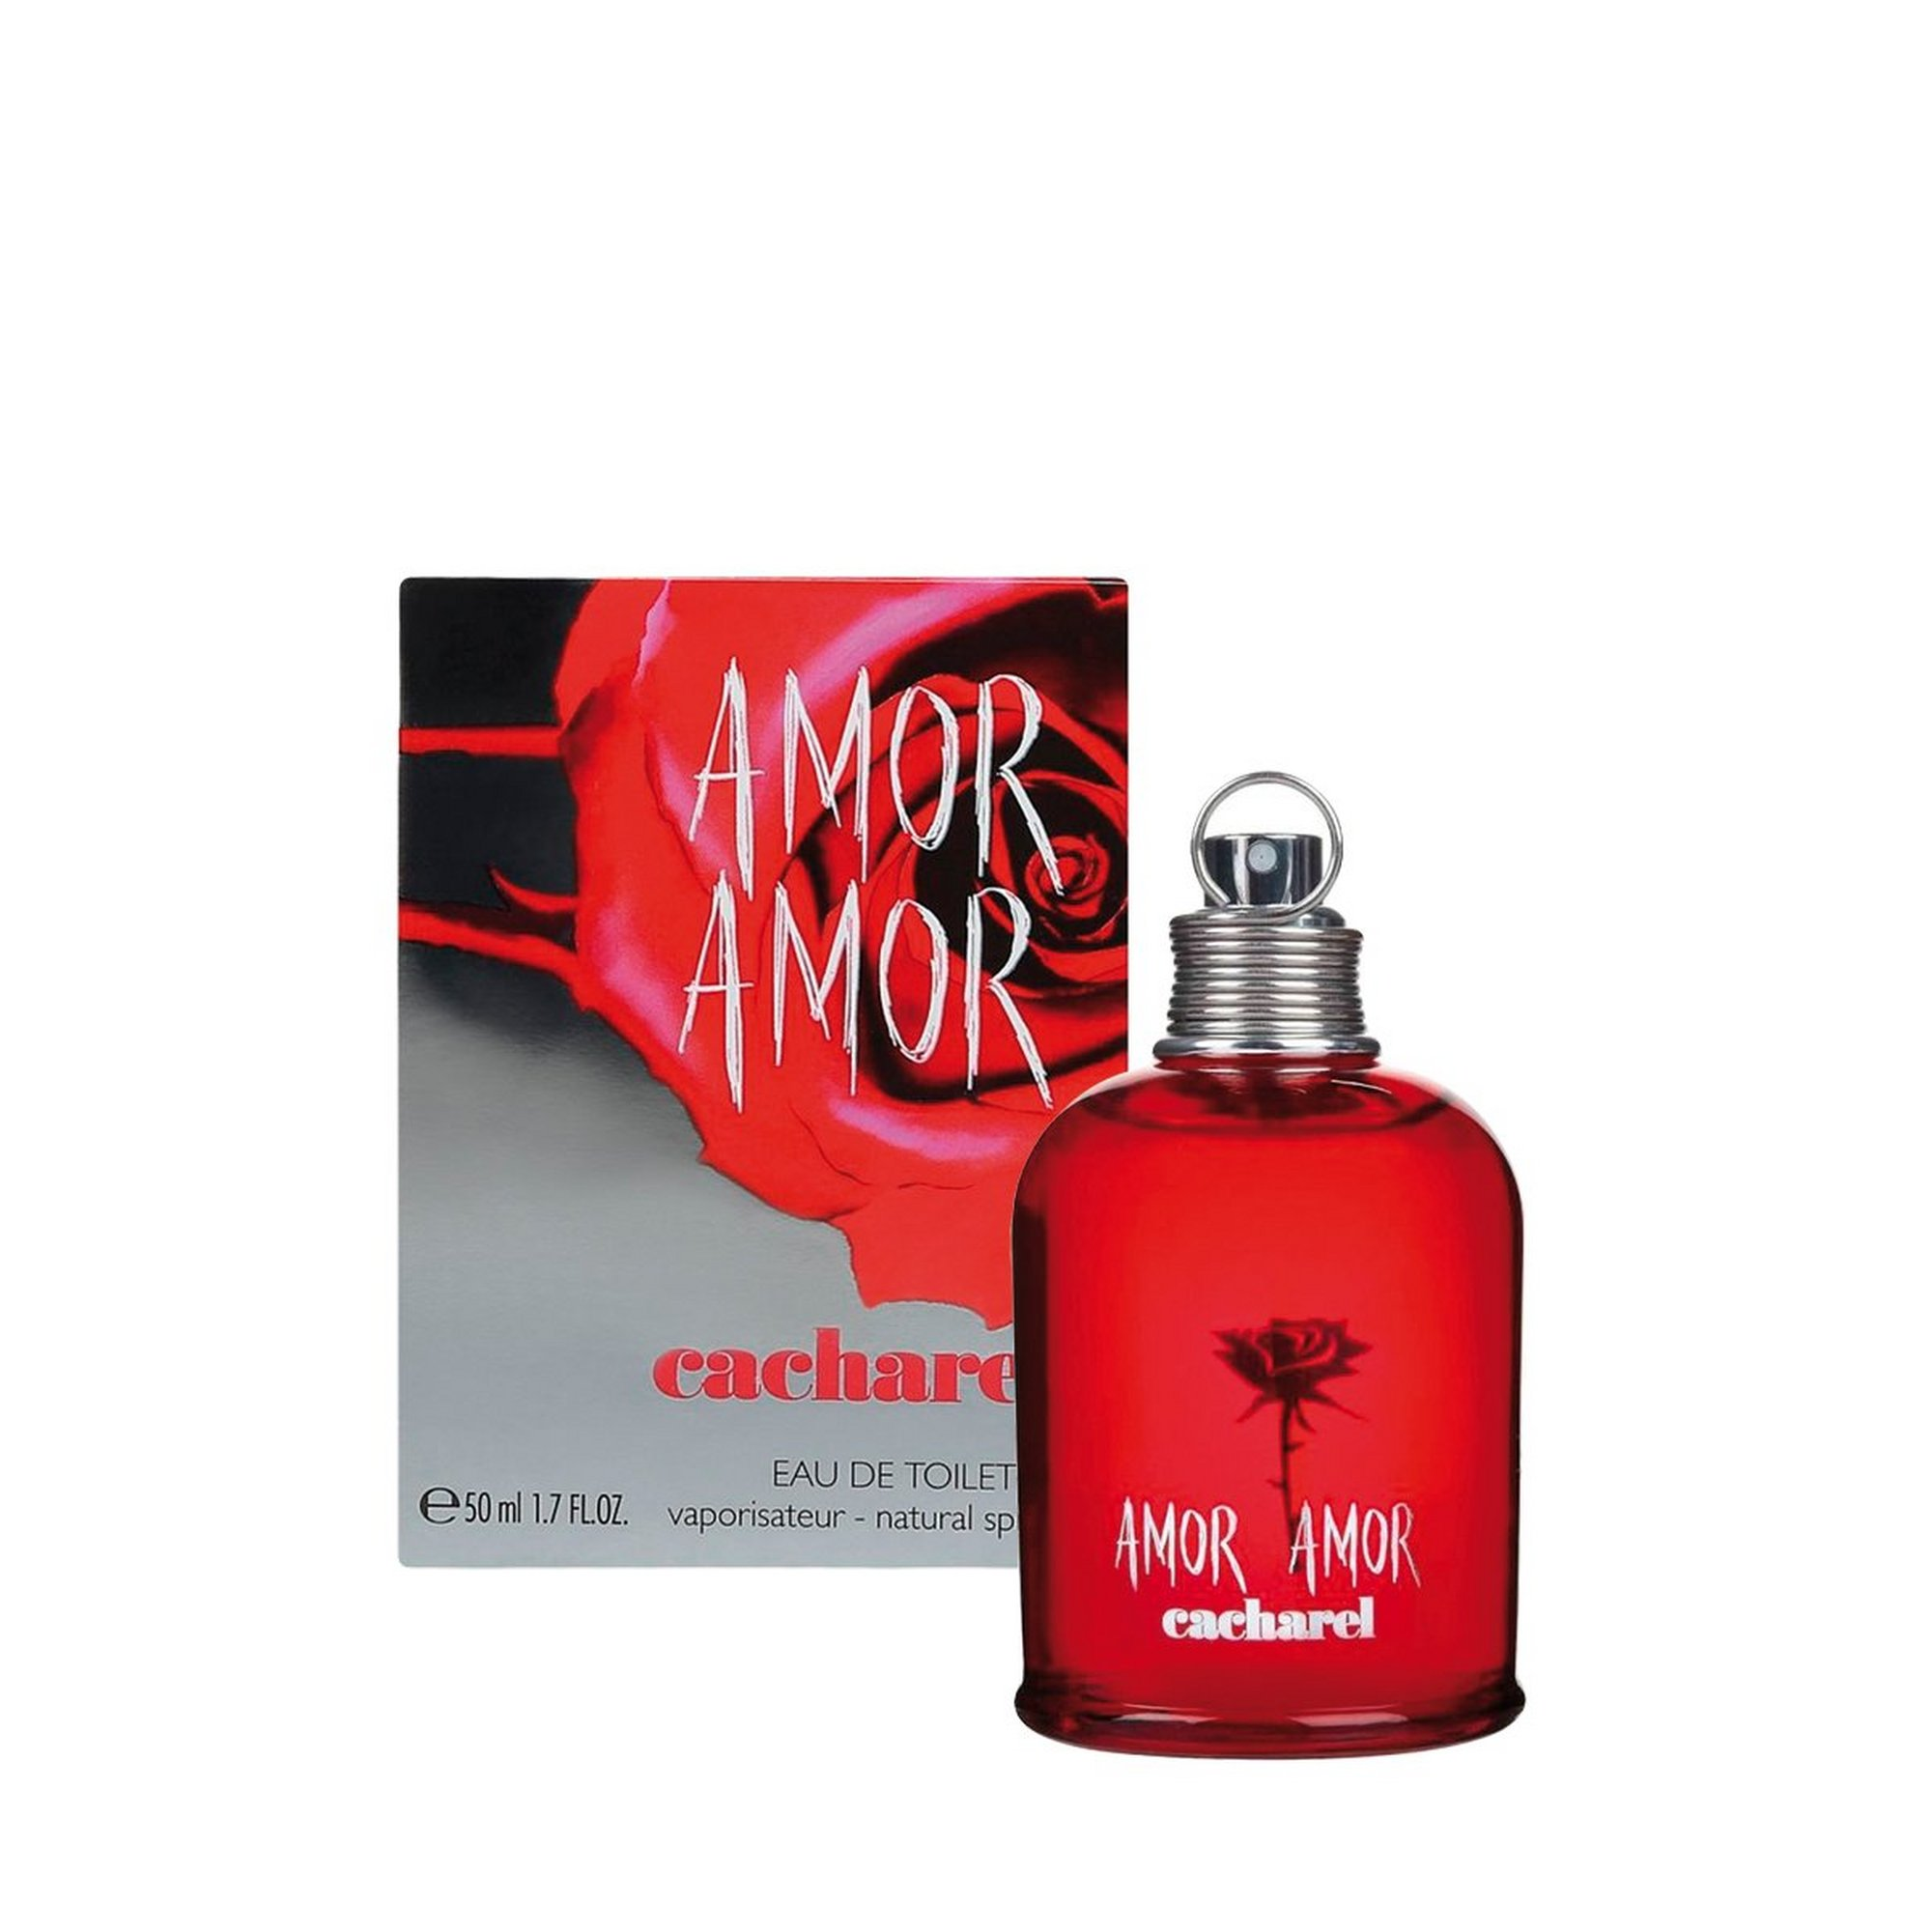 Image of Cacharel Amor Amor 150ml EDT